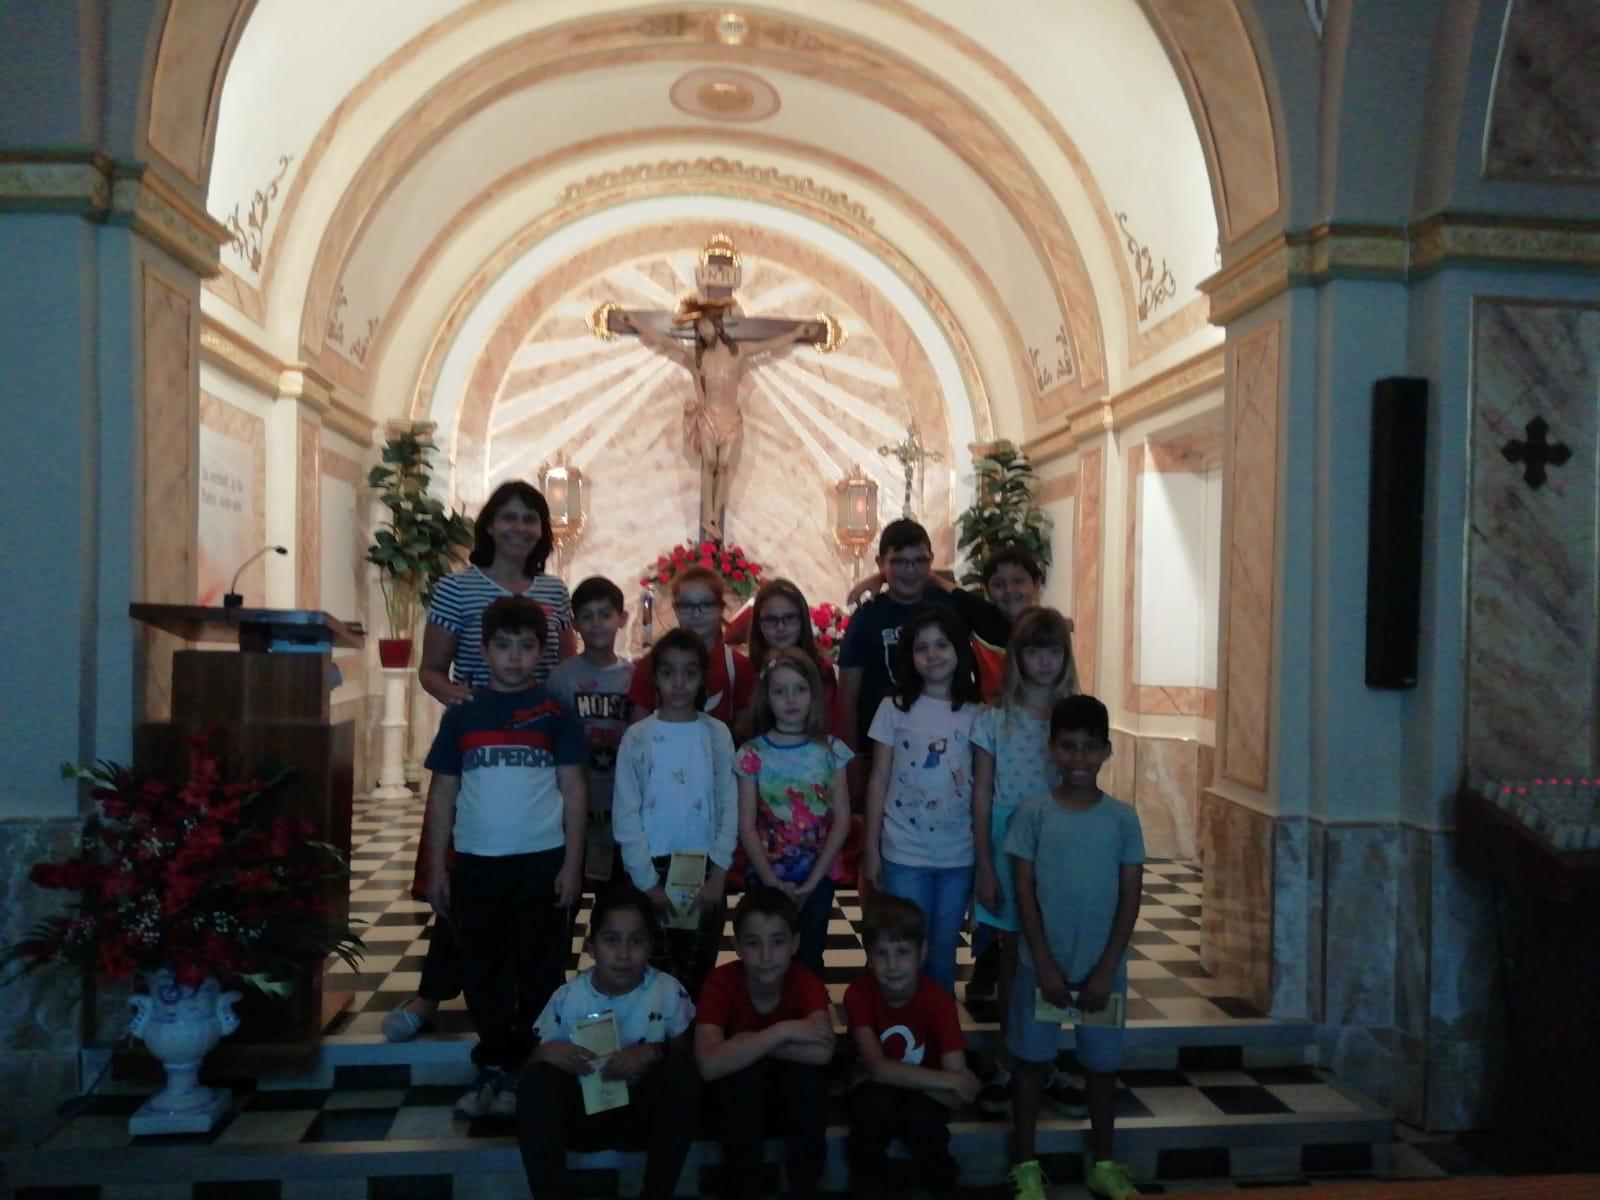 (2019-05-24) Visita ermita alumnos Laura - 3 A primaria - Reina Sofia - María Isabel Berenguer (07)